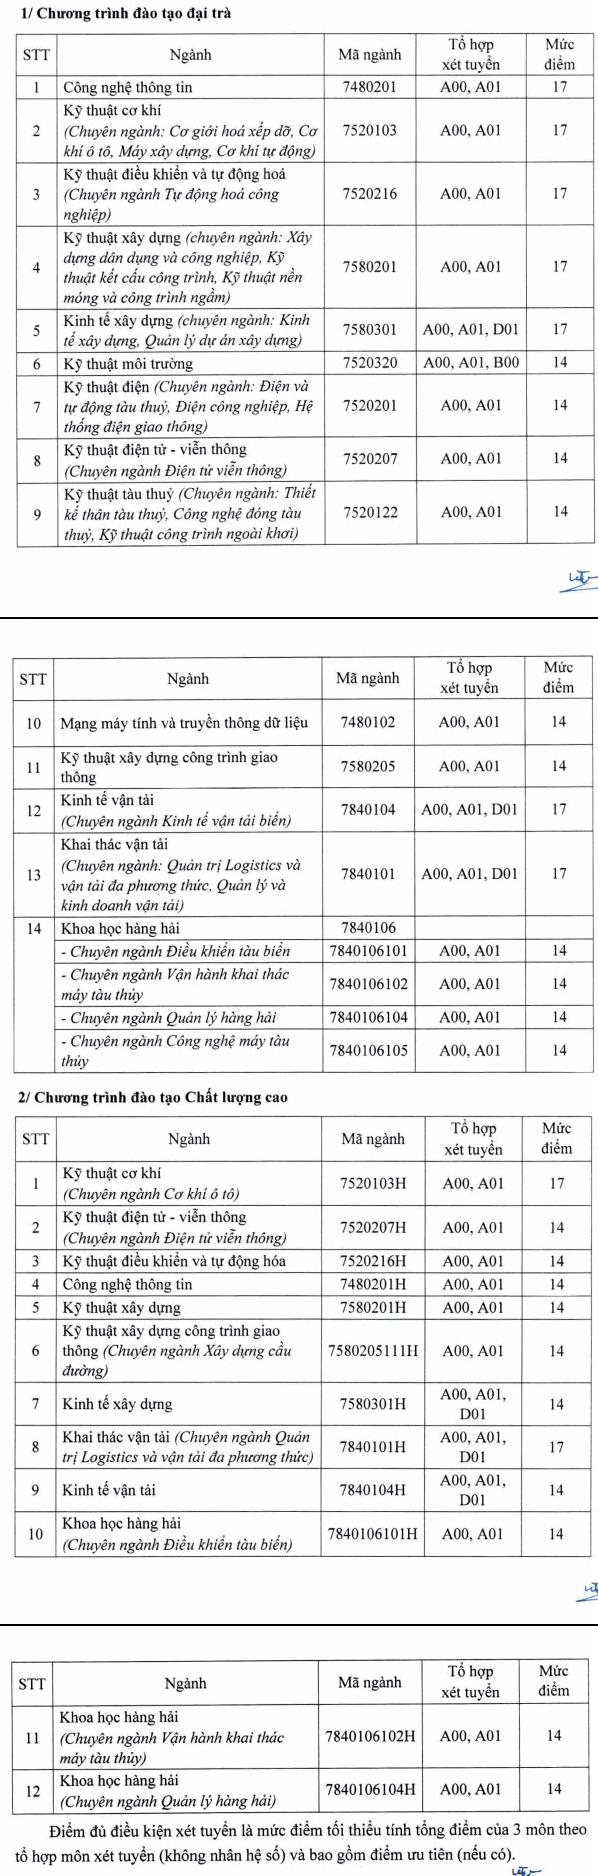 Dai hoc Giao thong van tai TPHCM cong bo diem san xet tuyen 2019